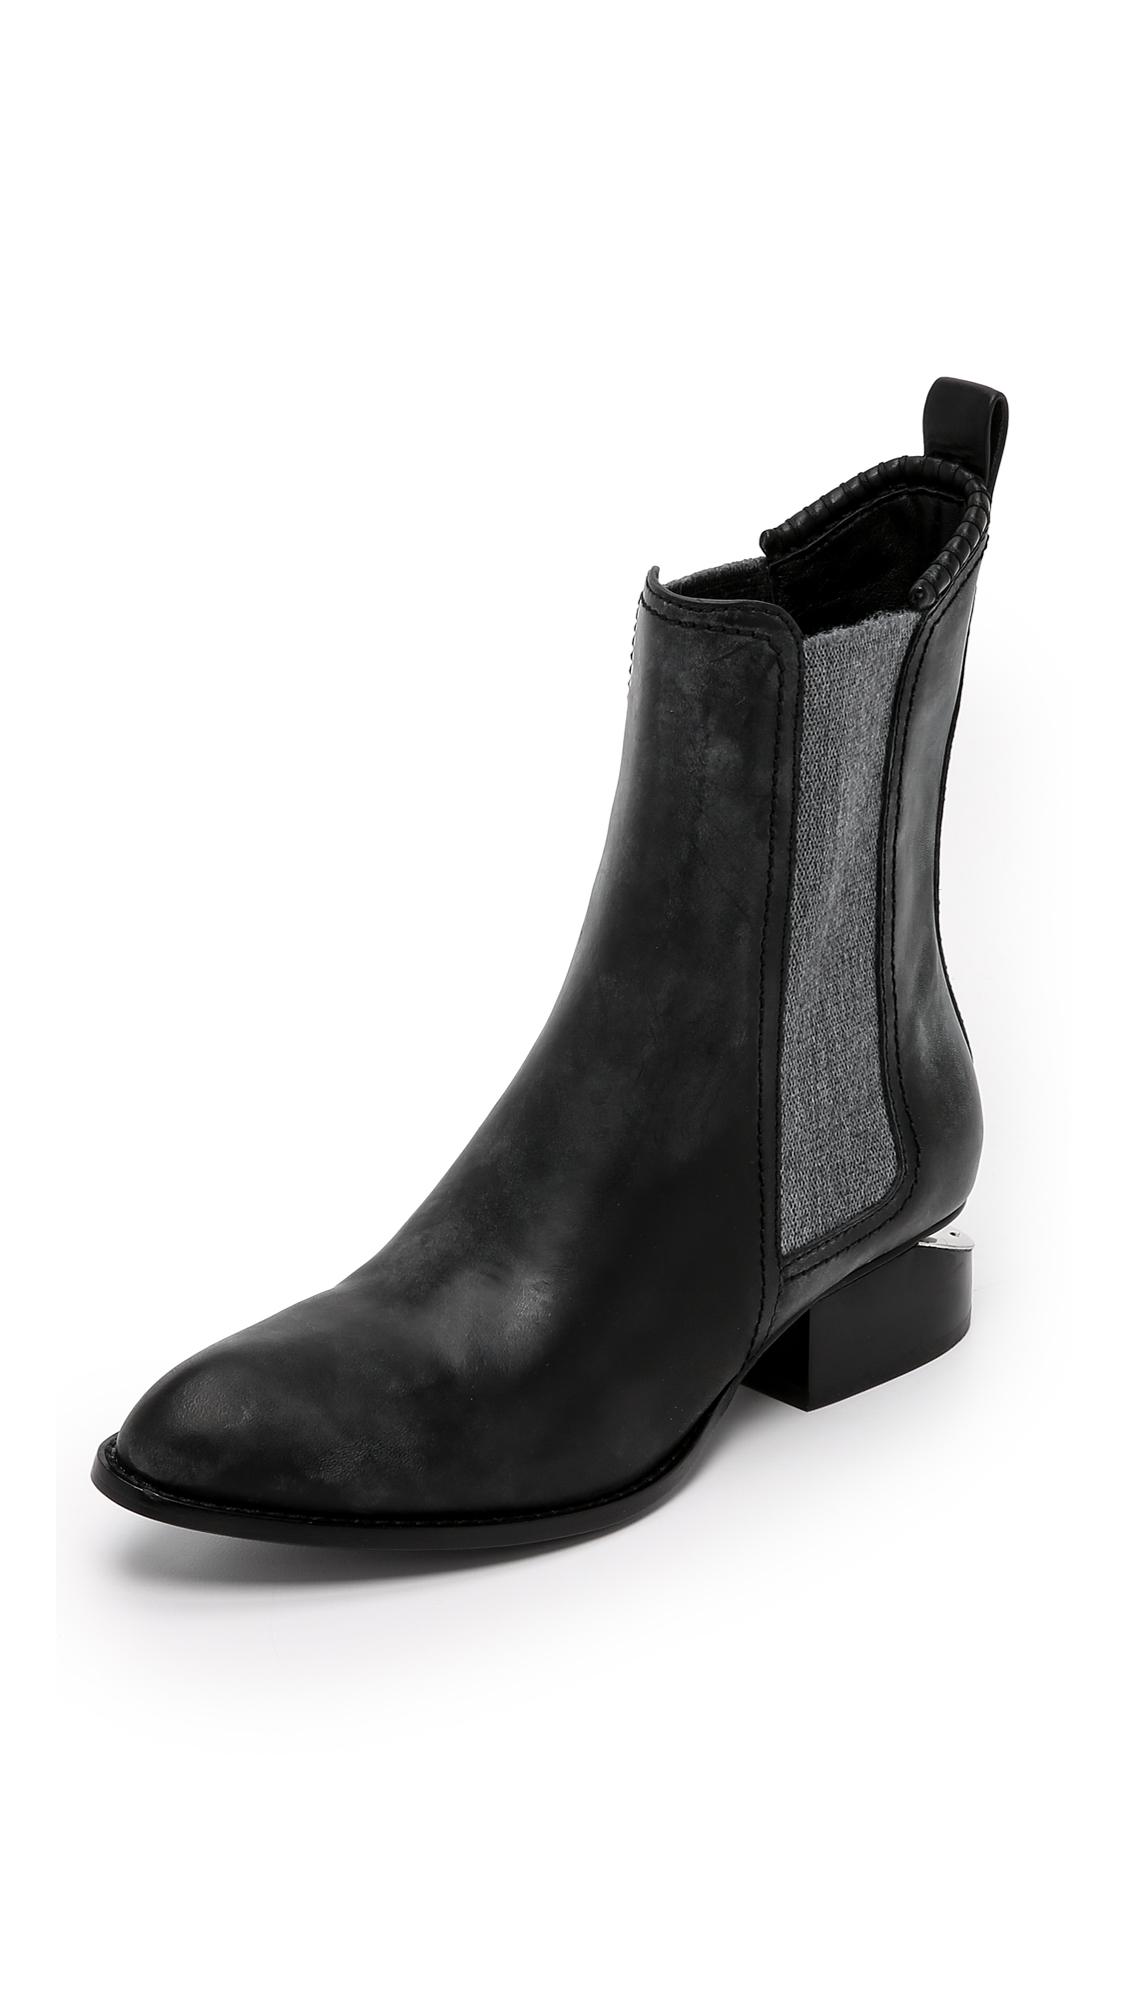 Alexander Wang Anouck Chelsea Boots - Black at Shopbop